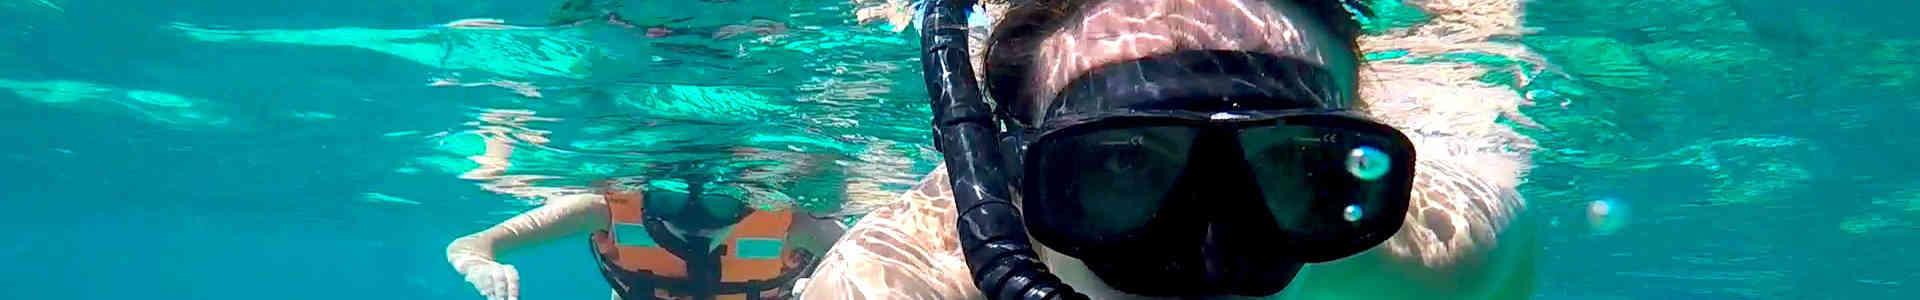 beach-villas-zanzibar-snorkelling